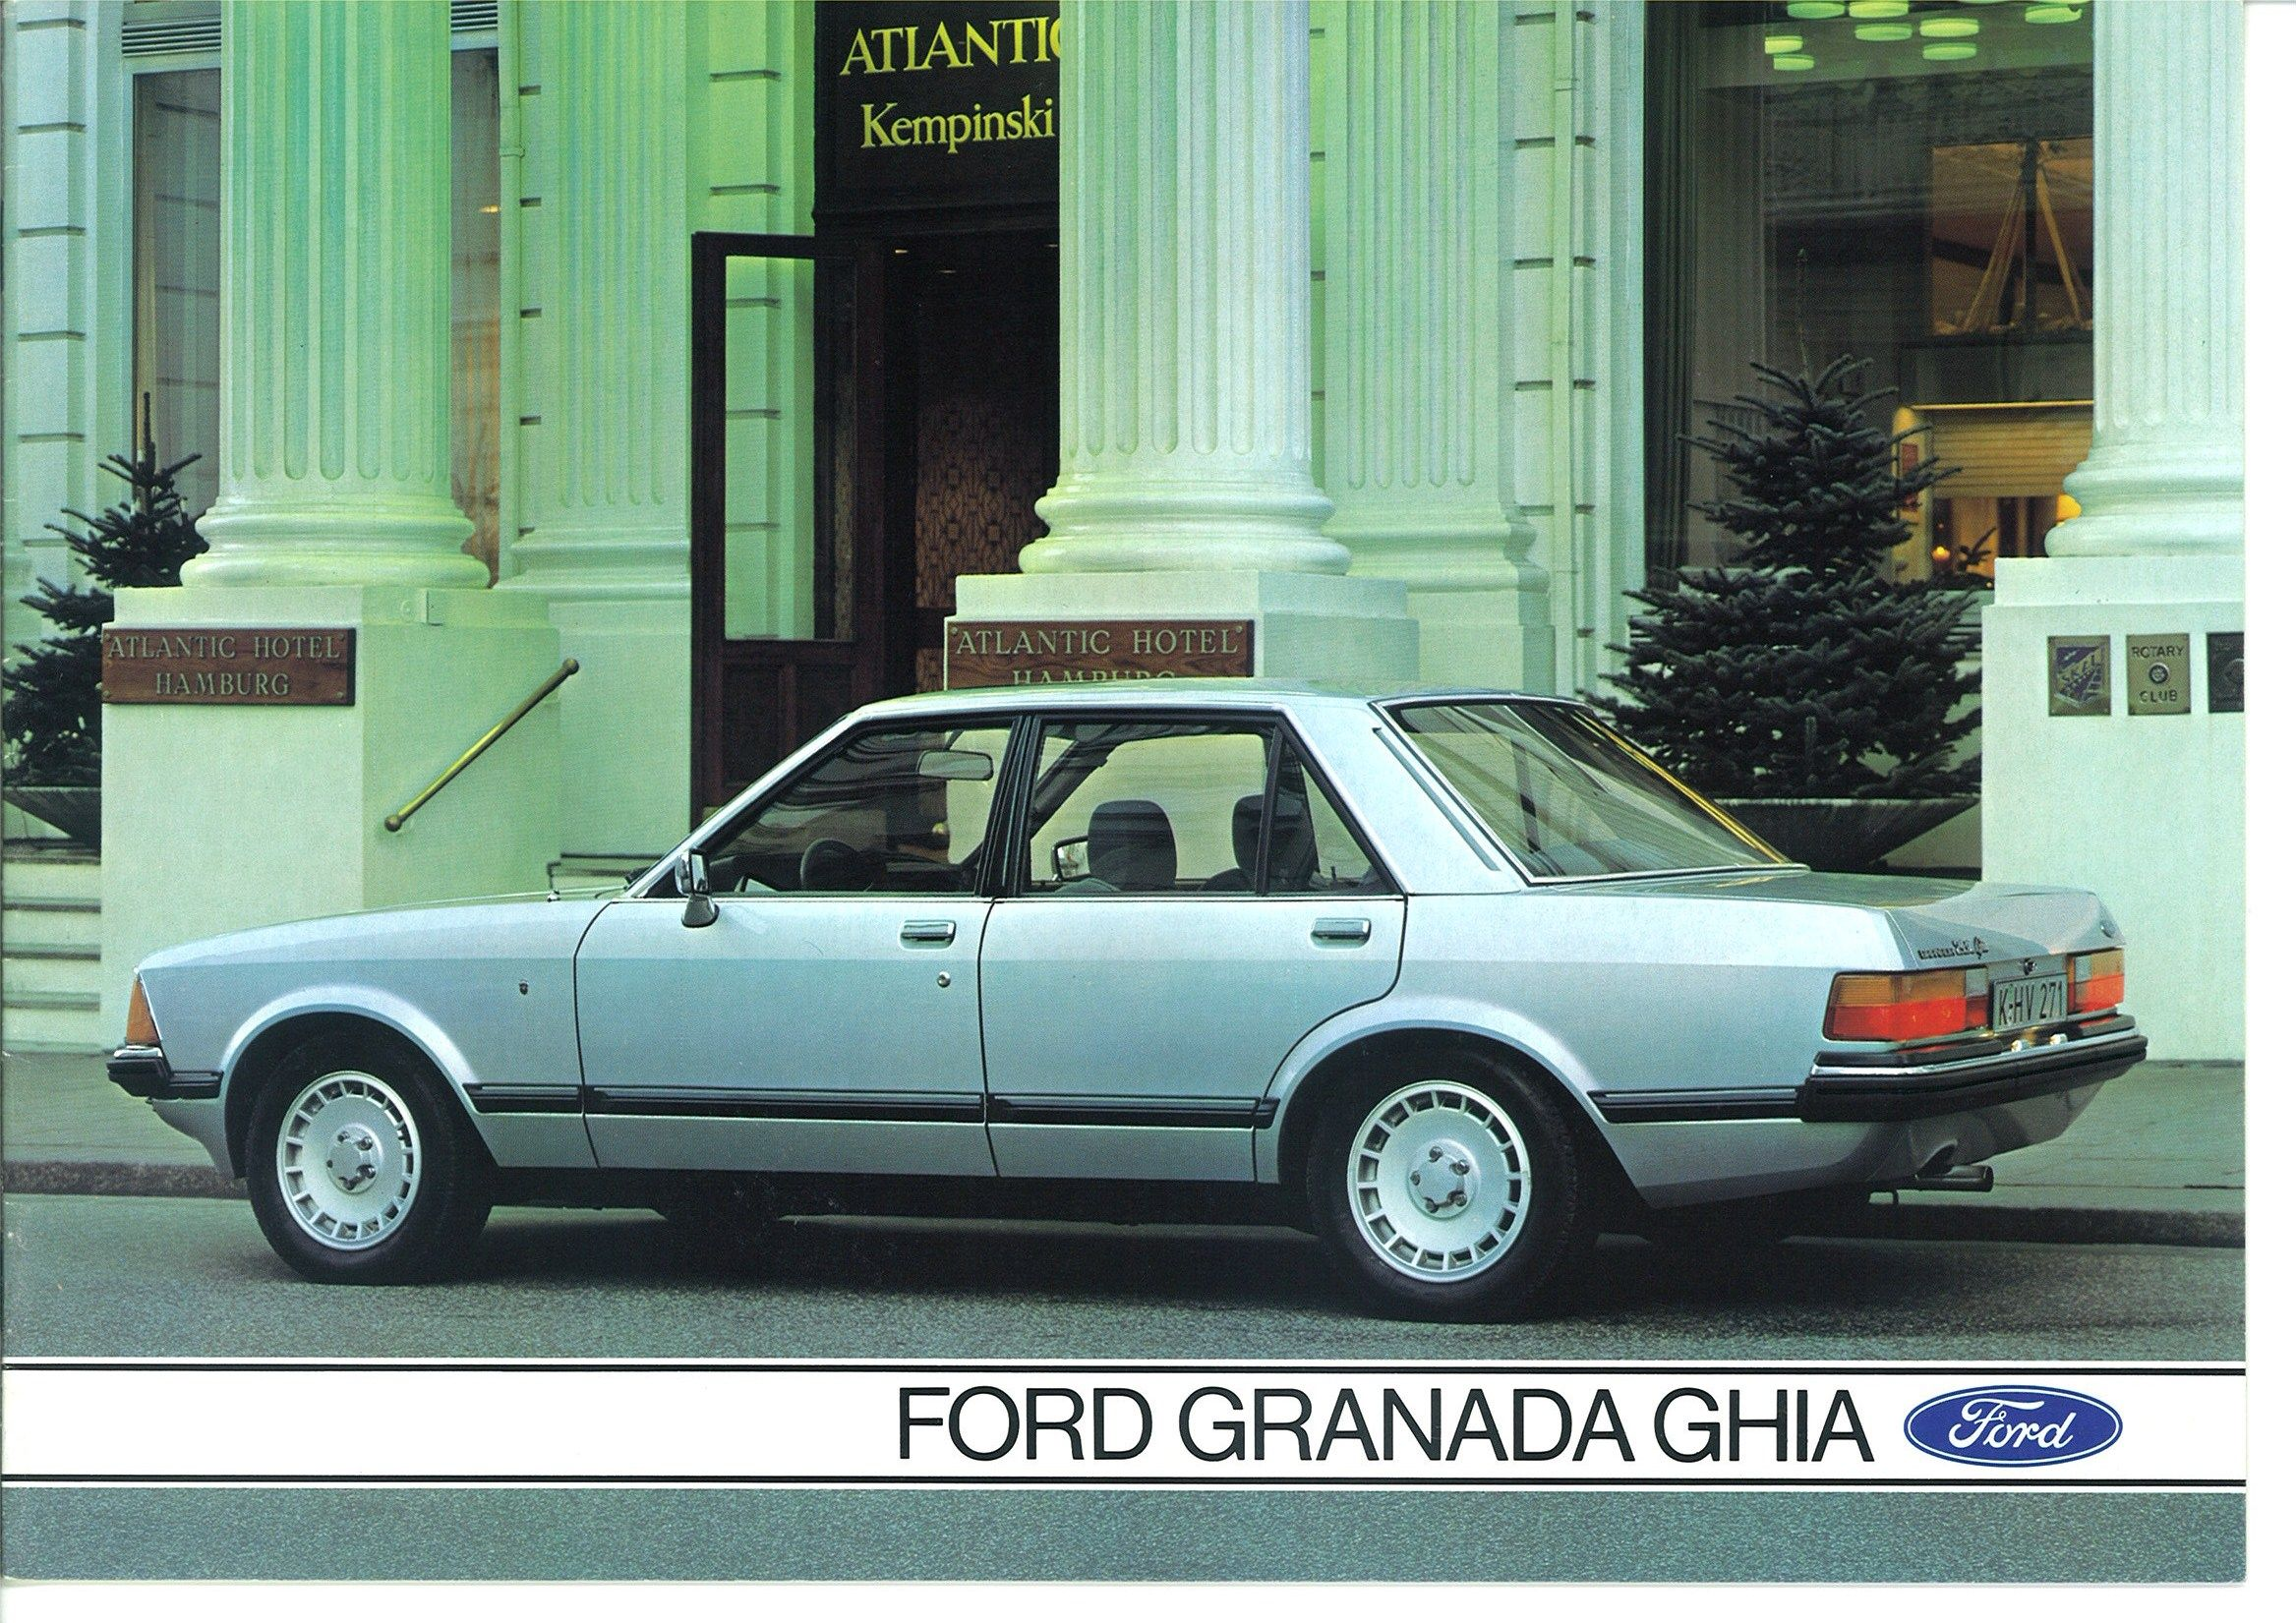 1981 Ford Granada Ghia 2 8i Ford Granada Ford Police British Cars